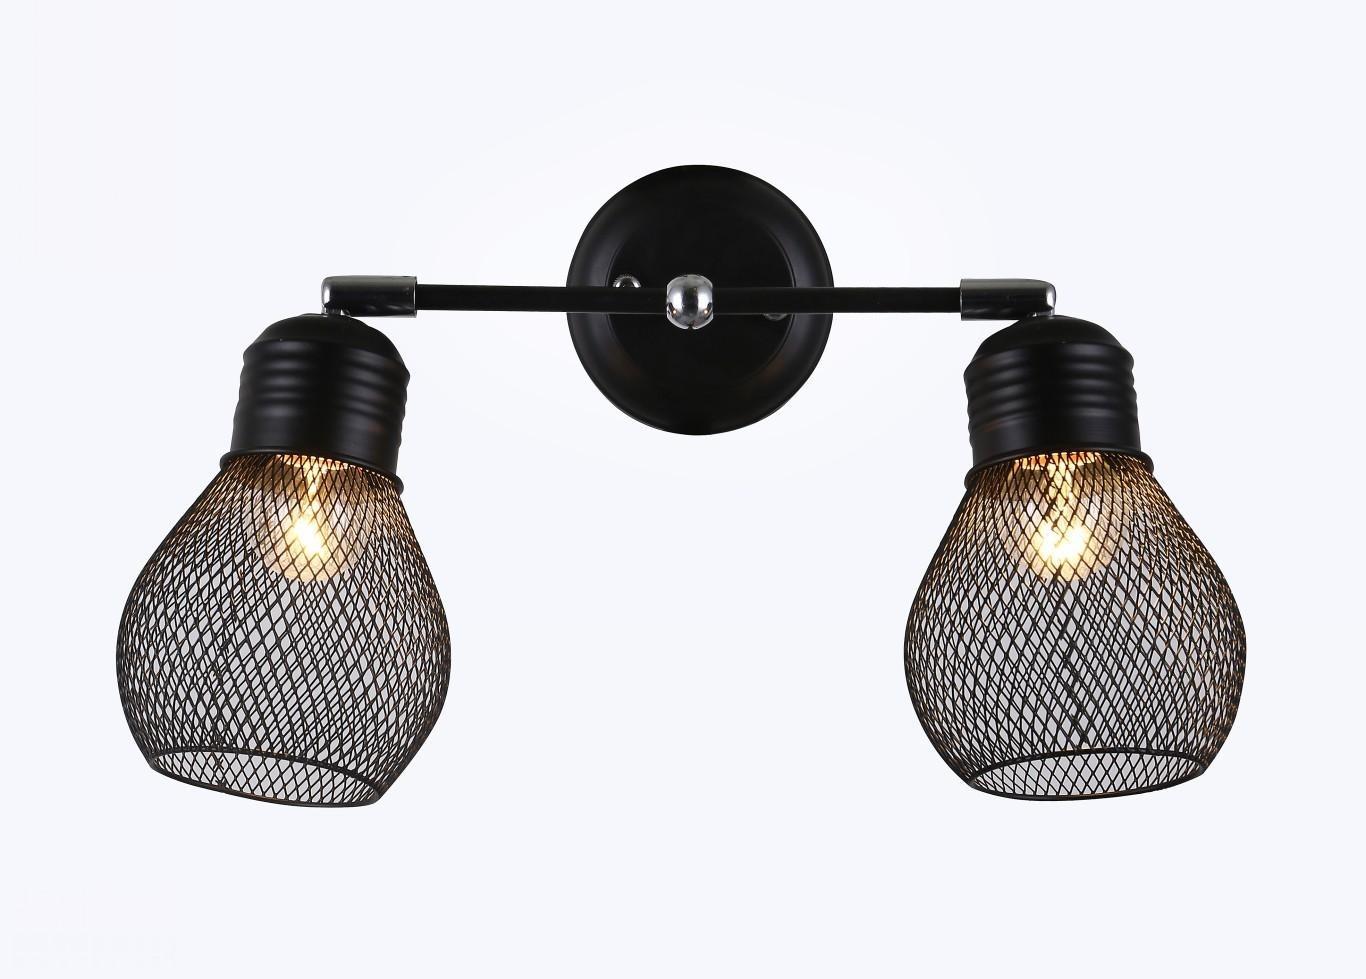 Pendente Metal Preto Cromado 2 Lâmpadas - Sindora